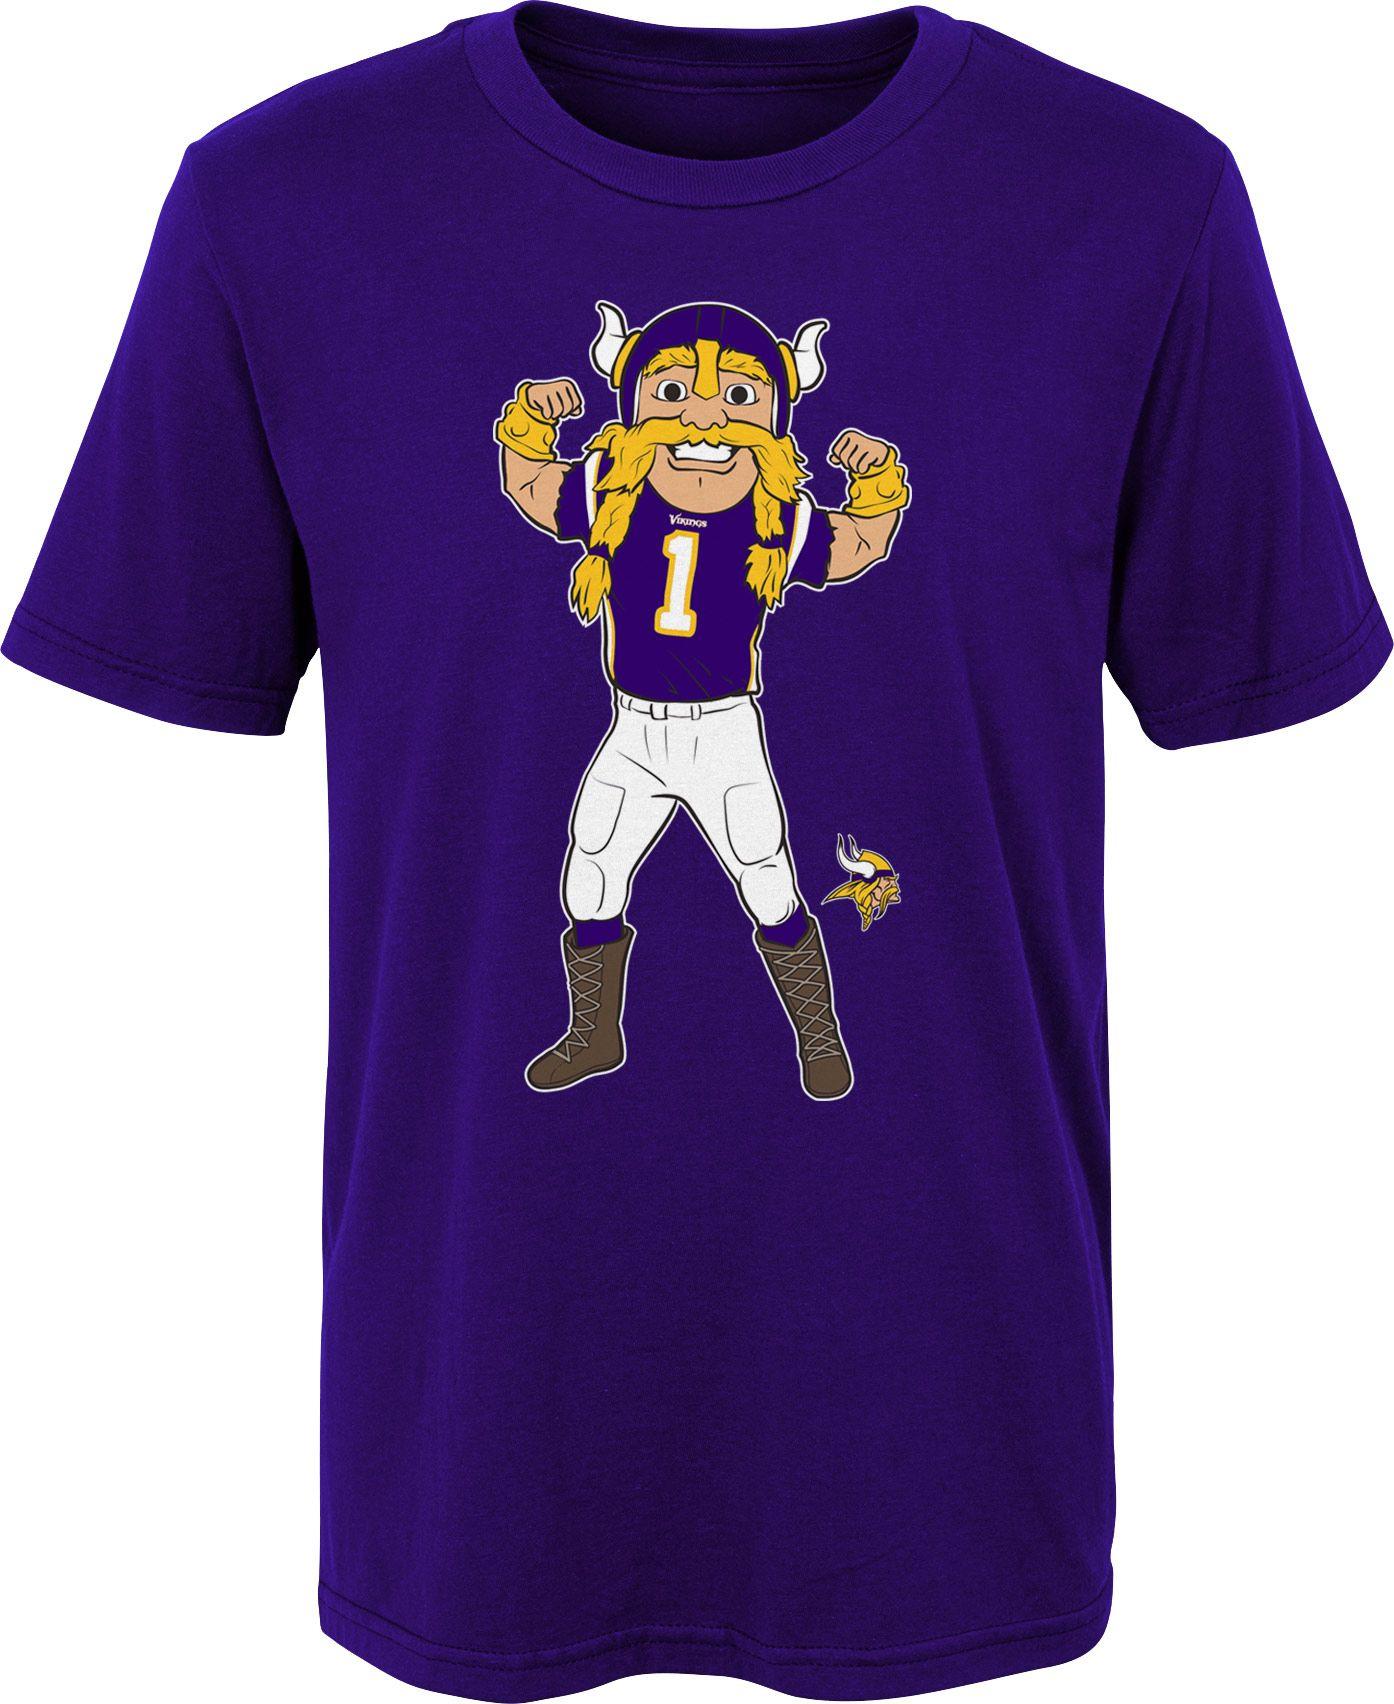 Cheap Minnesota Vikings T Shirts 2b9995edc